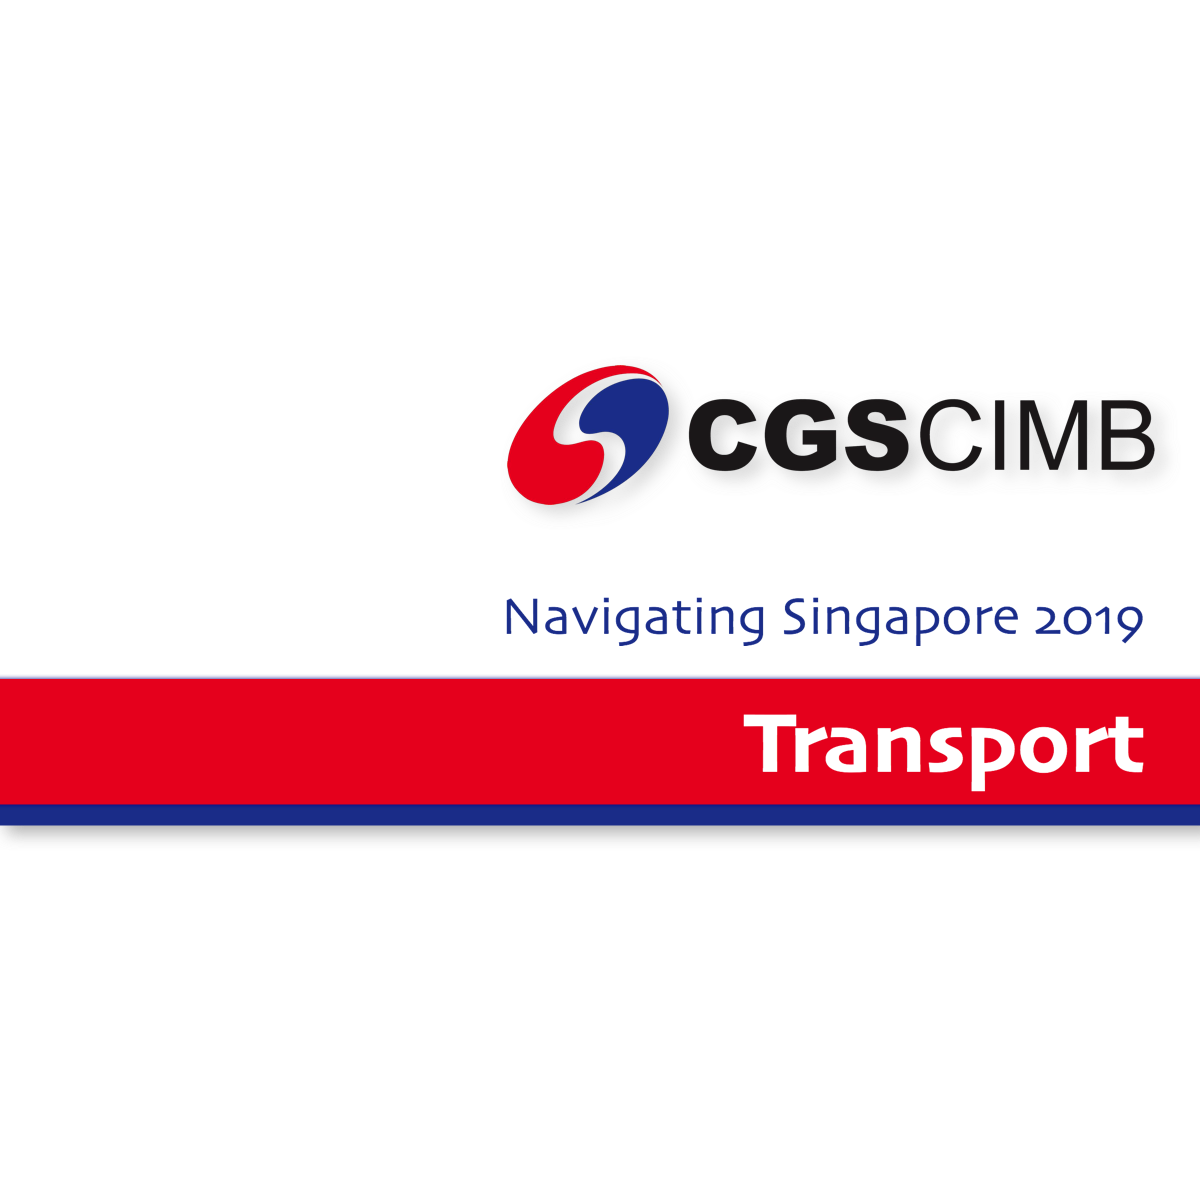 Navigate Singapore 2019 ~ Transport Sector - CGS-CIMB Research | SGinvestors.io